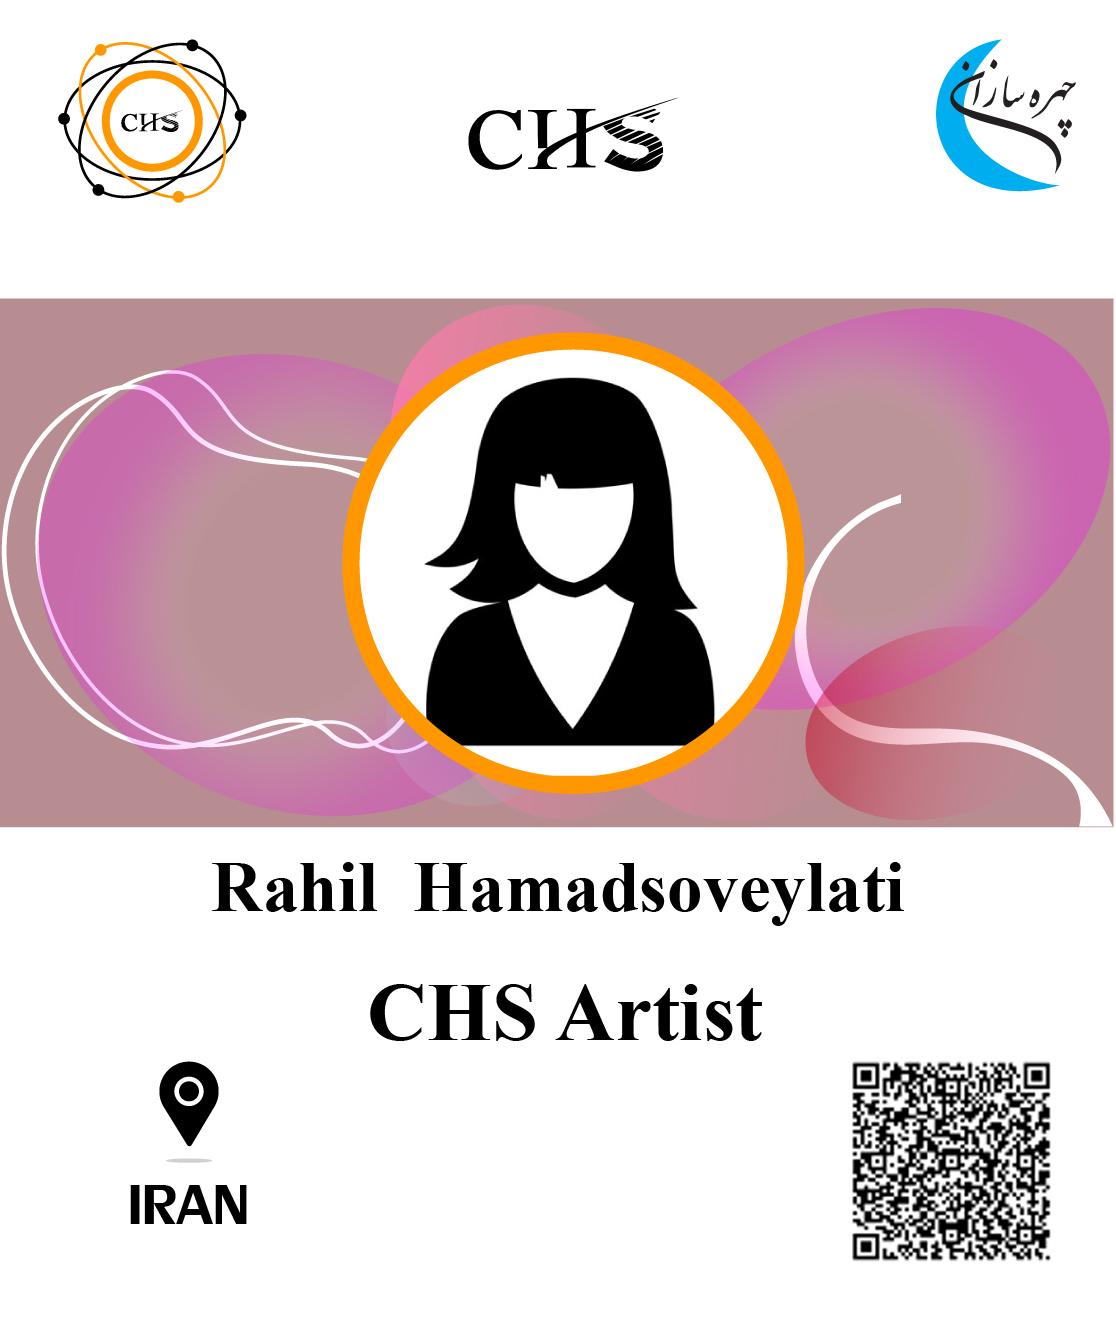 Rahil Hamadsoveylati, Shinion training certificate, Shinion, Shinion certificate, Shinion training, Shinion training Rahil Hamadsoveylati, Shinion training certificate Rahil Hamadsoveylati